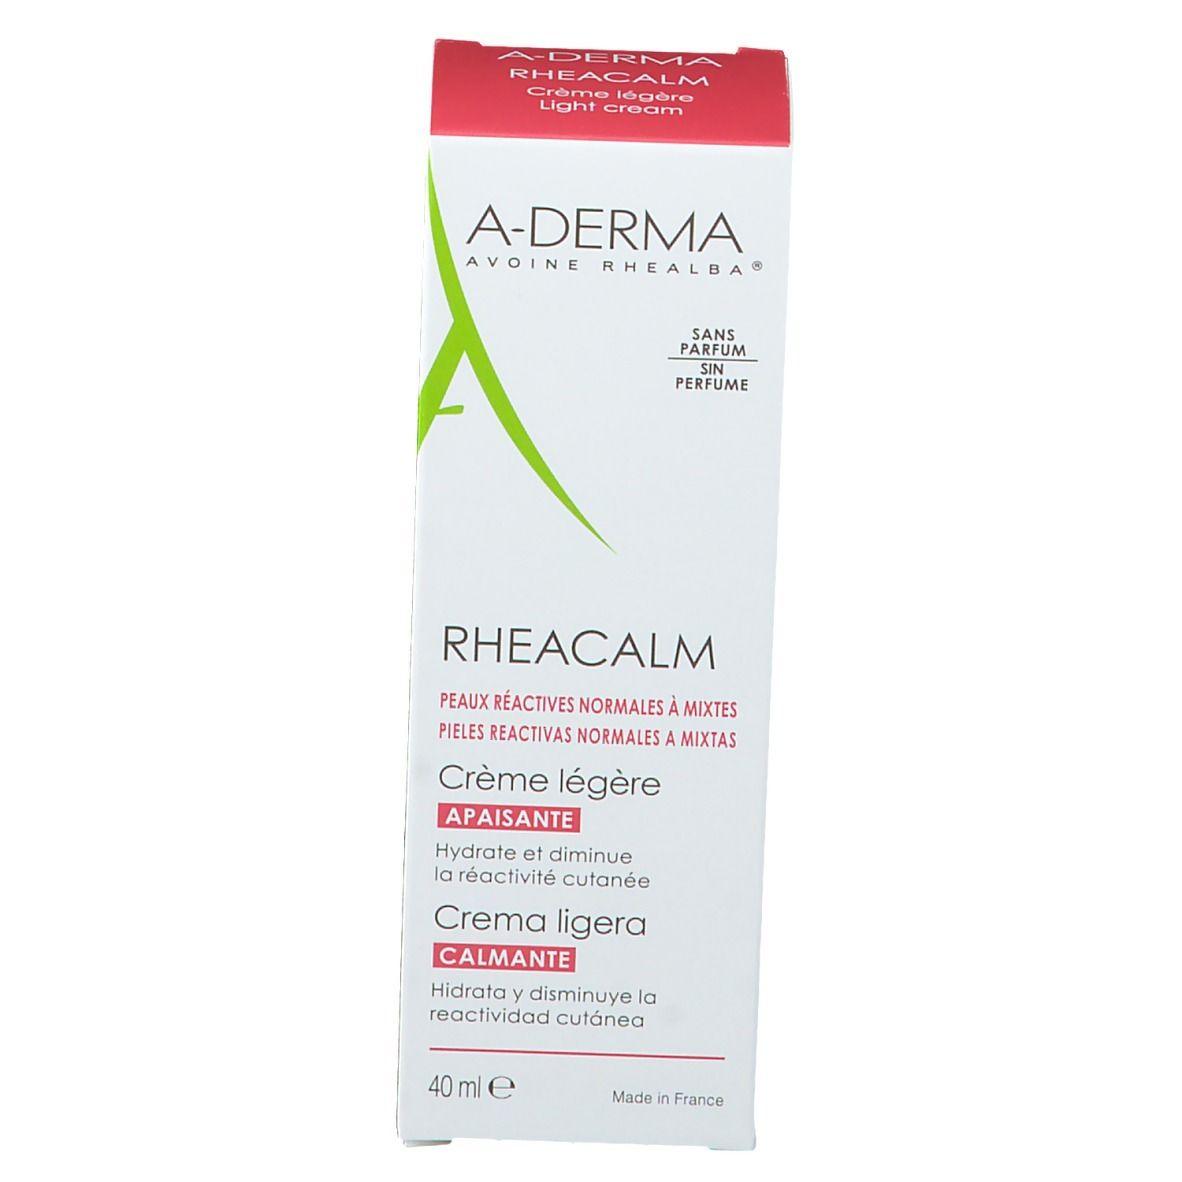 A-Derma RHEACALM beruhigende Creme leicht